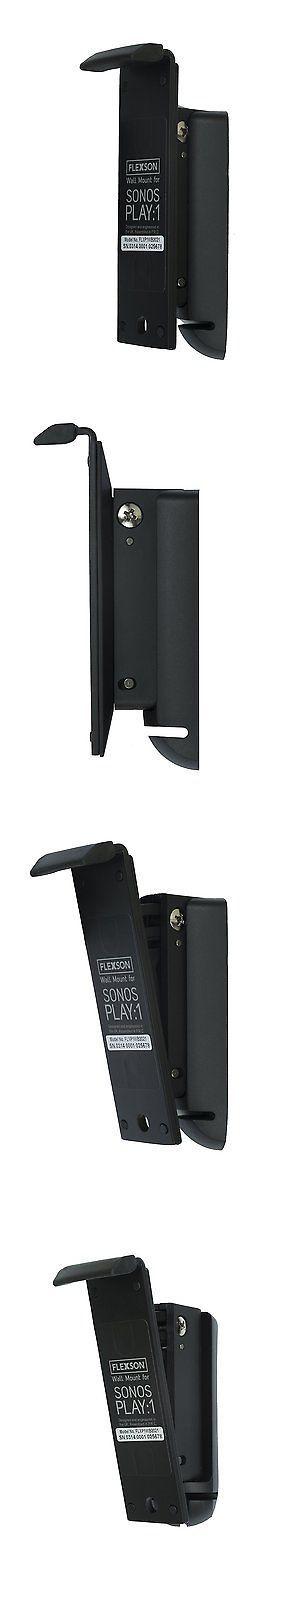 Speaker Mounts and Stands: Flexson Single Steel Wall Mount Bracket For Sonos Play:1 Speaker - Black -> BUY IT NOW ONLY: $34.99 on eBay!